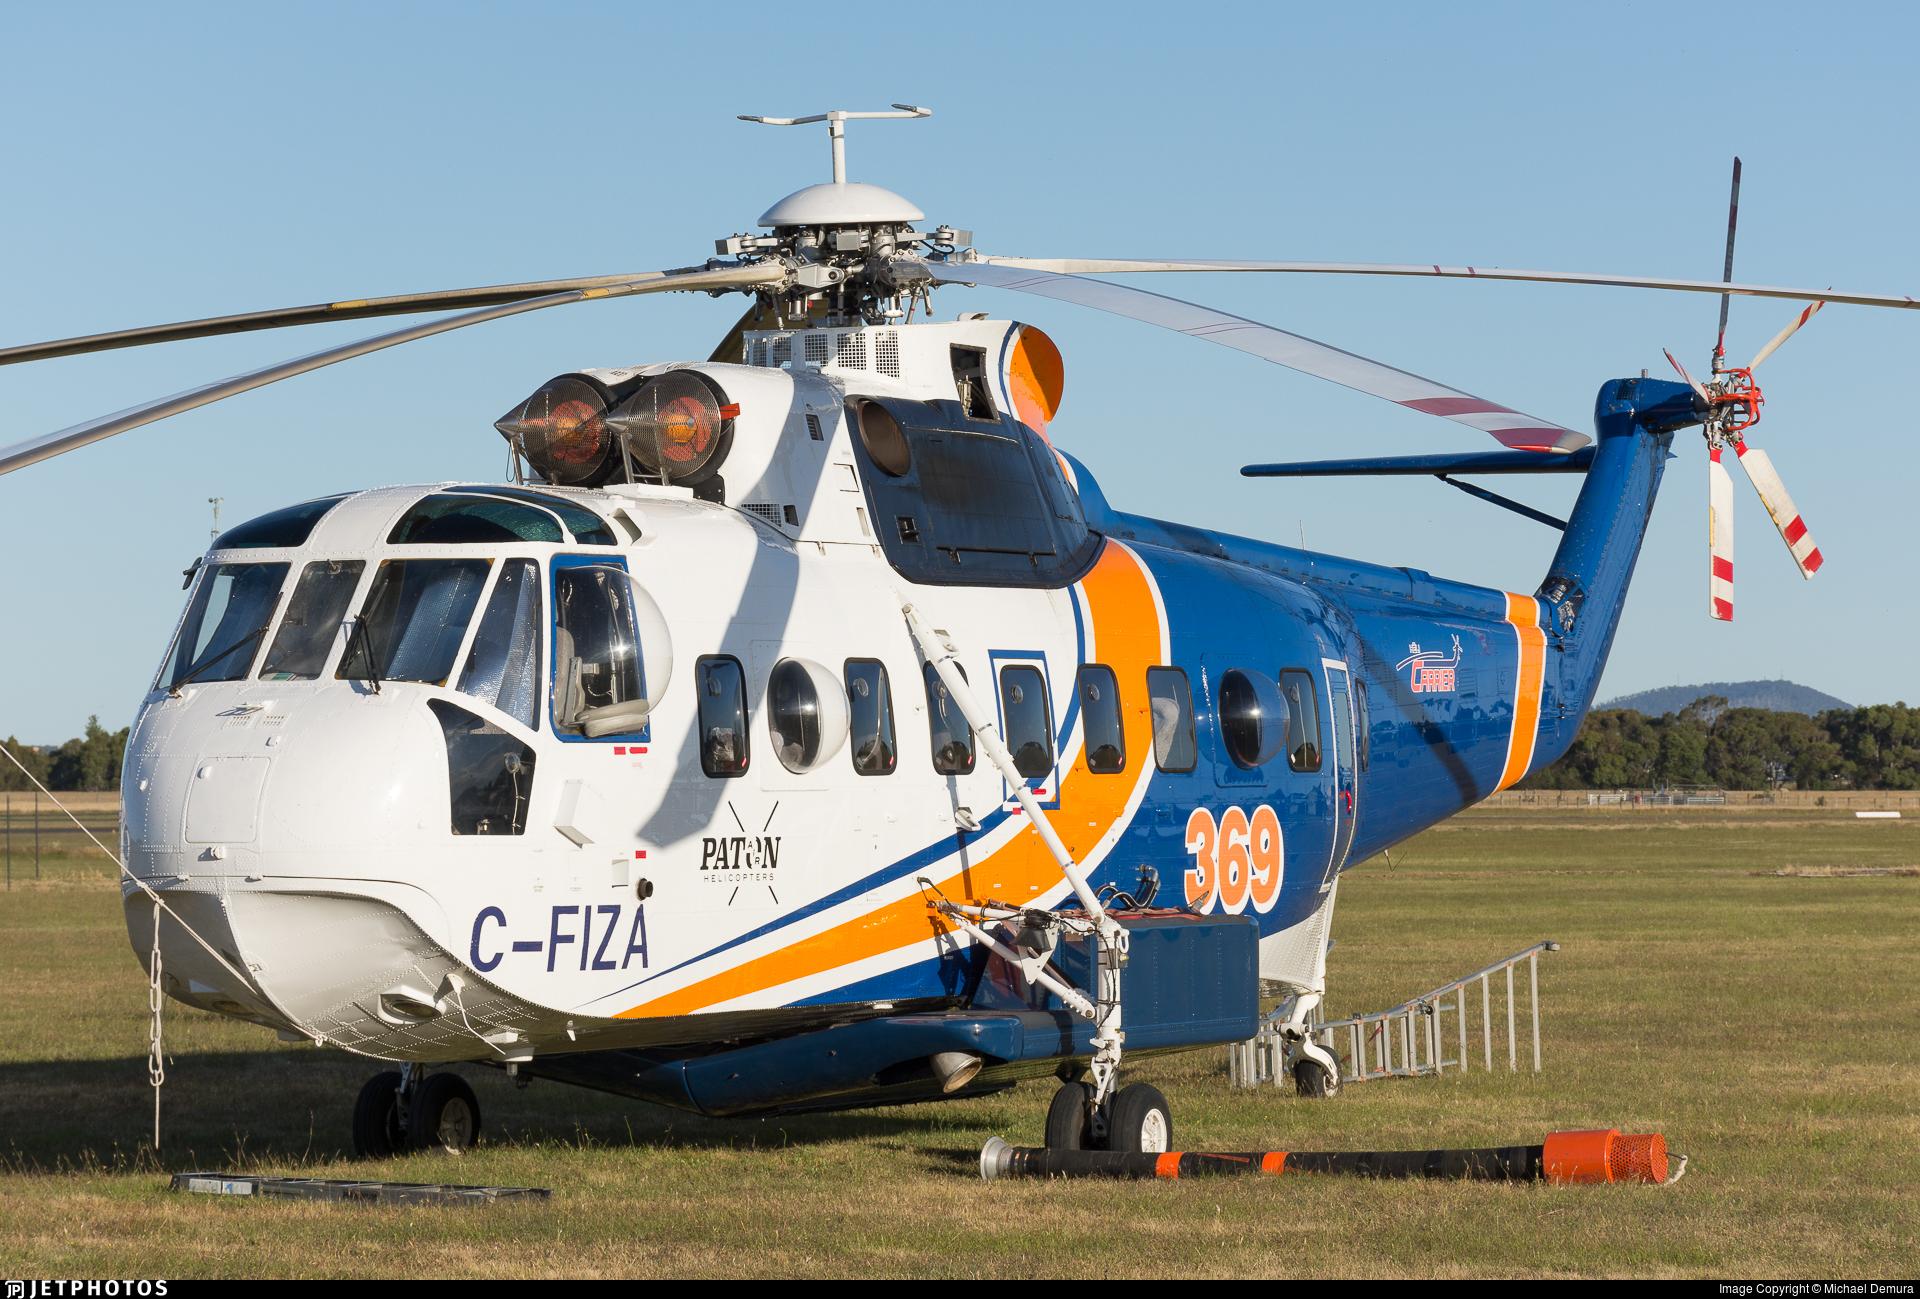 C-FIZA - Sikorsky S-61N - Hélicoptères Hélicarrier